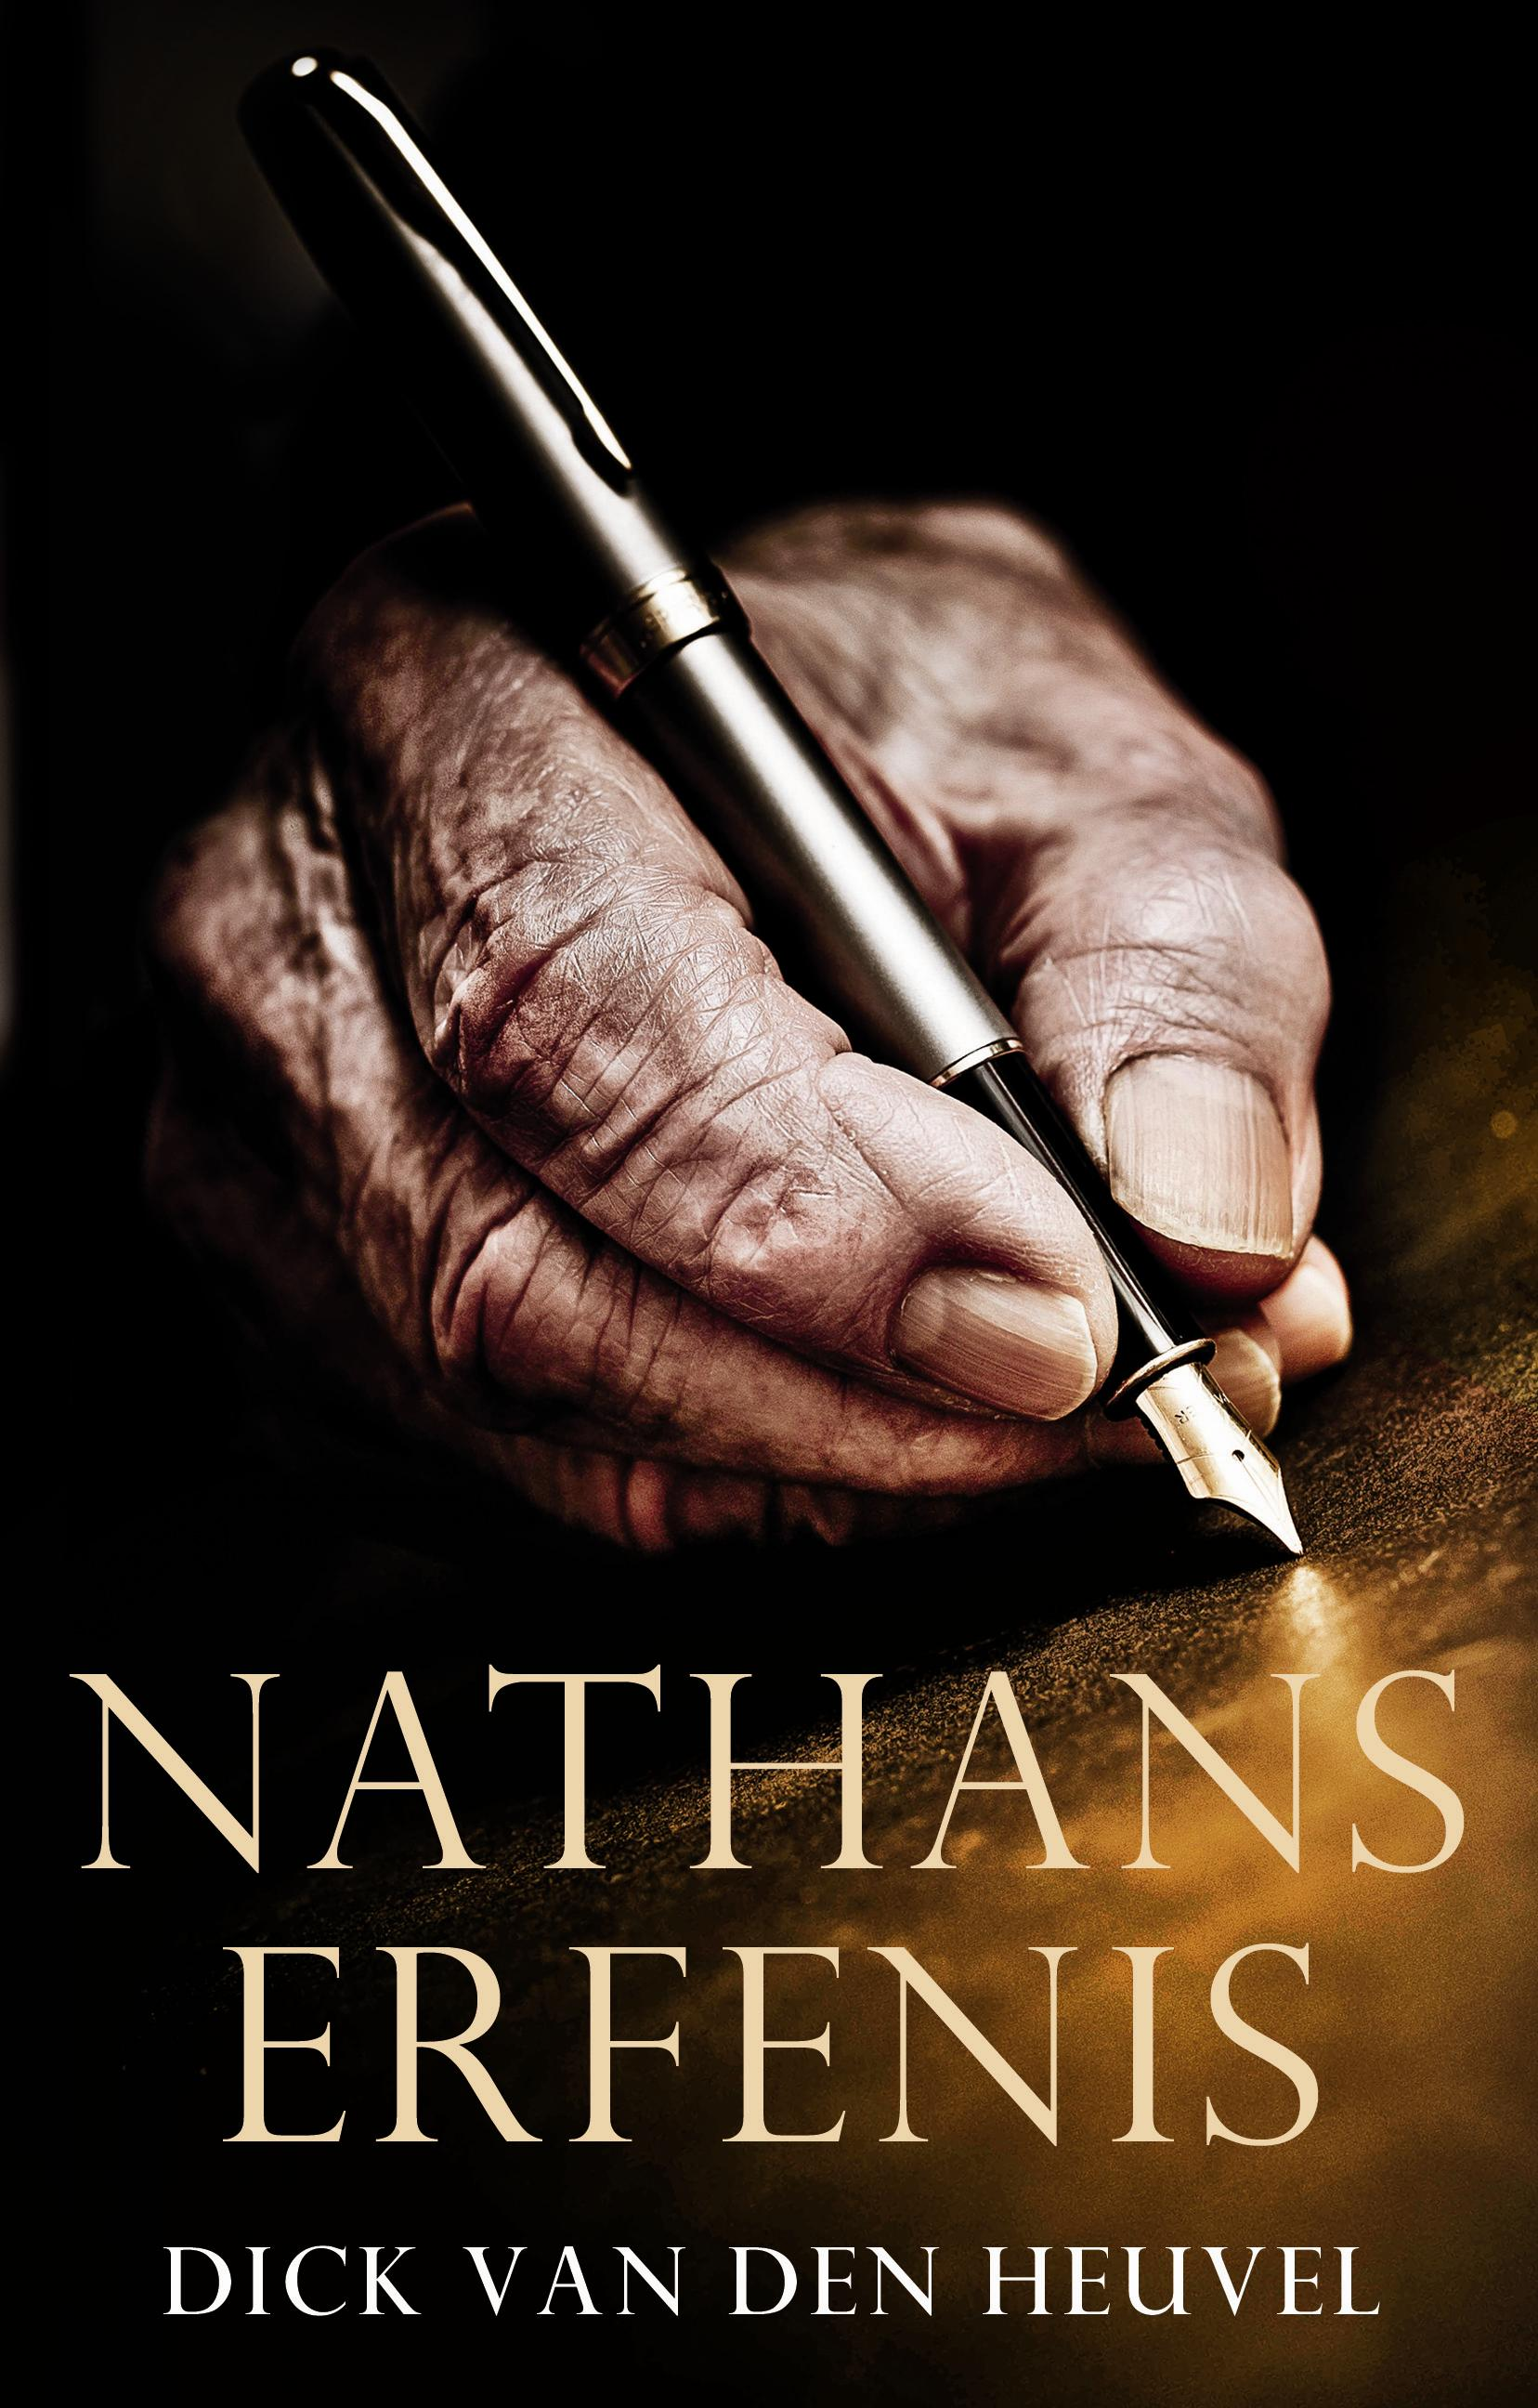 Nathans erfenis (e-book)